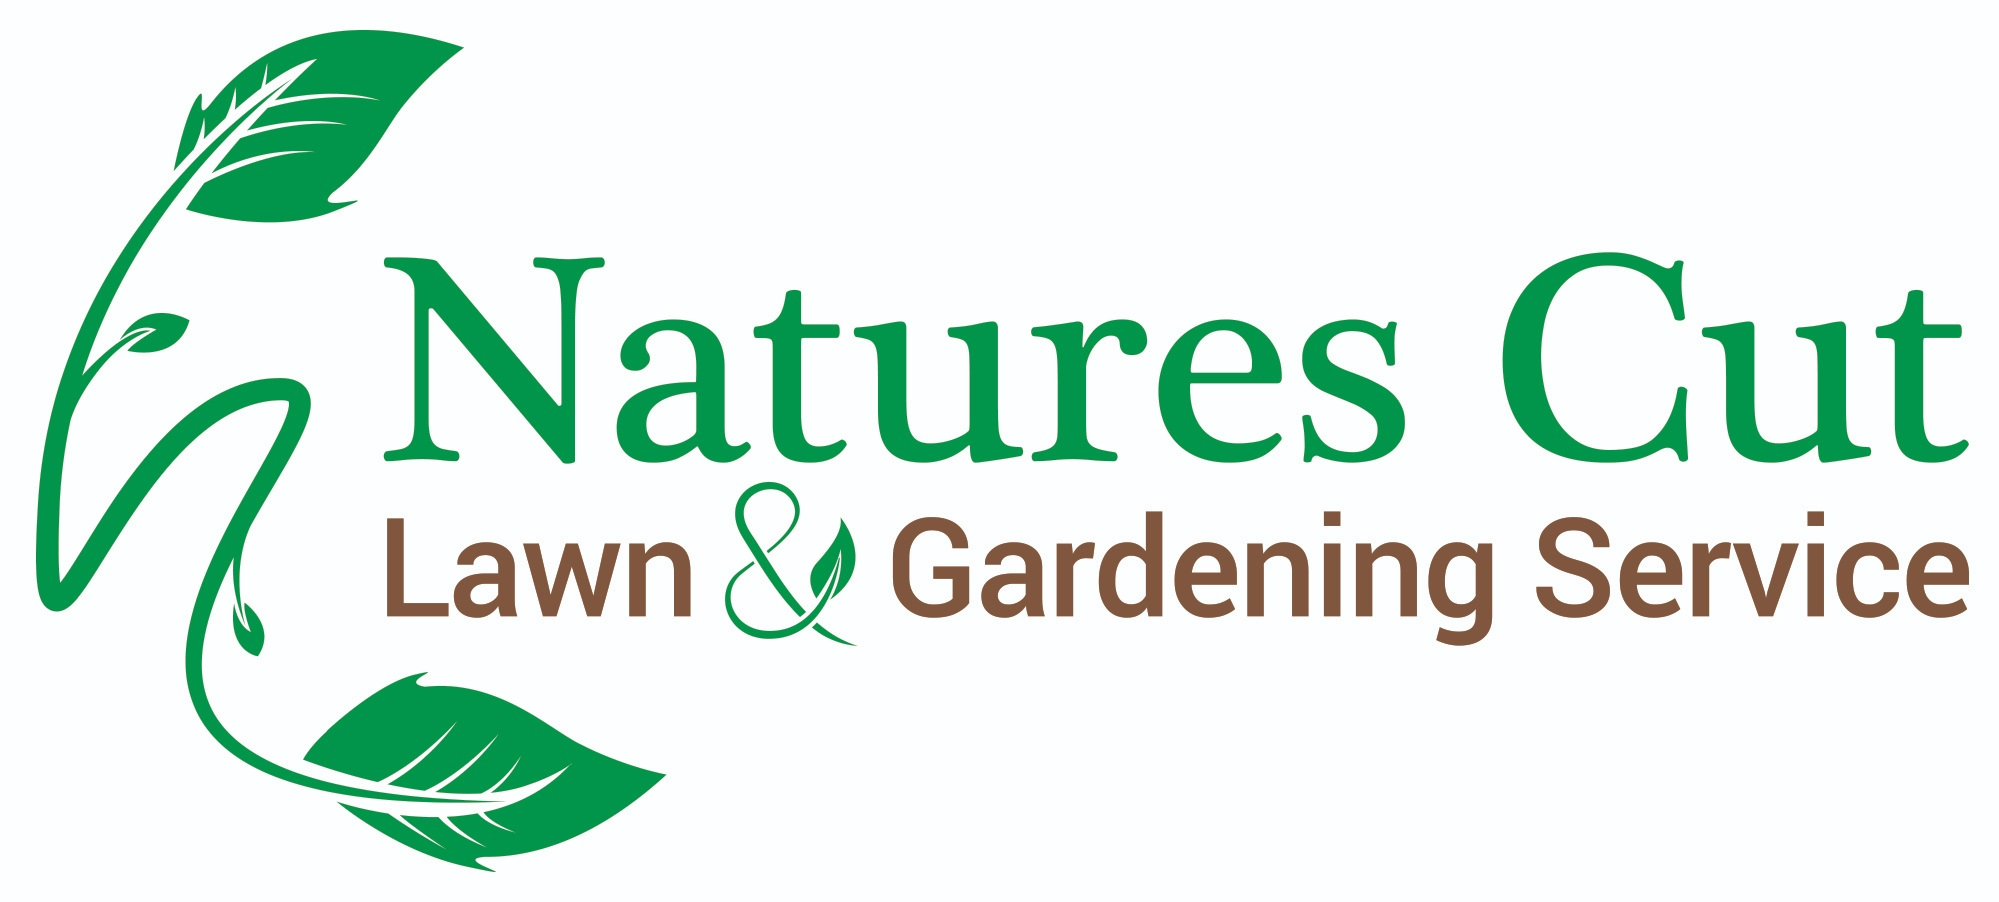 Nature+Cut+Lawn+%26+Gardening+Service.jpg